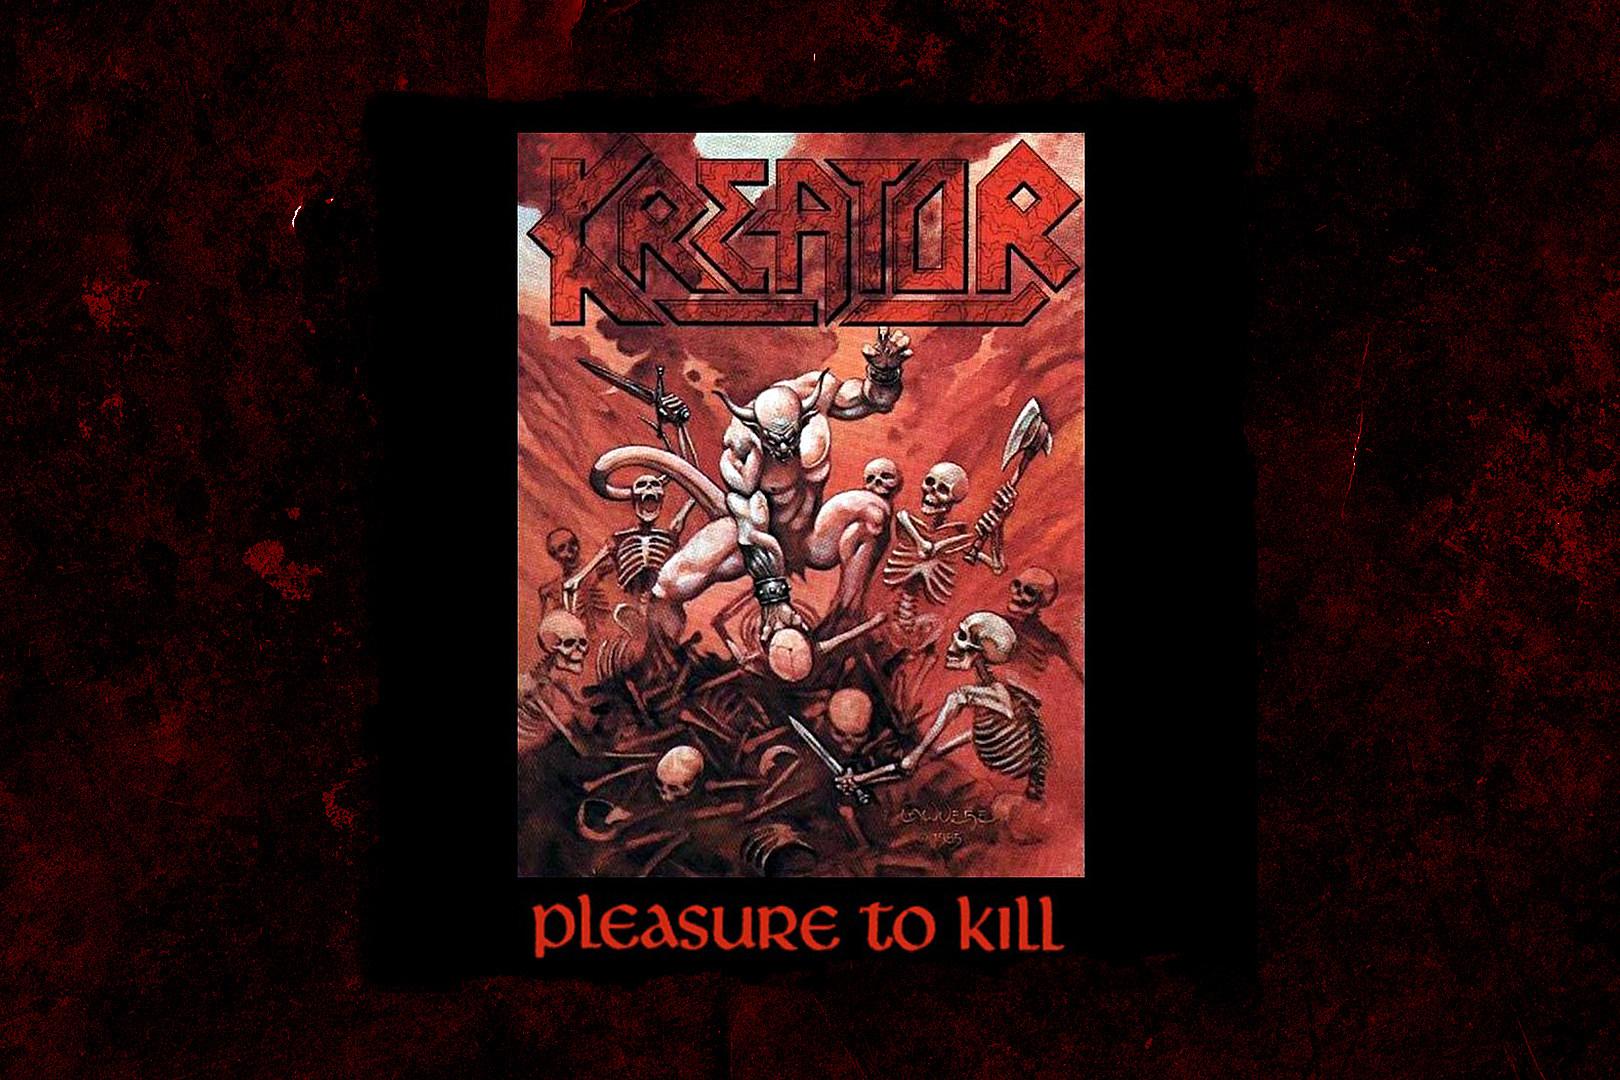 33 Years Ago: Kreator Push the Limits of Thrash With 'Pleasure to Kill'